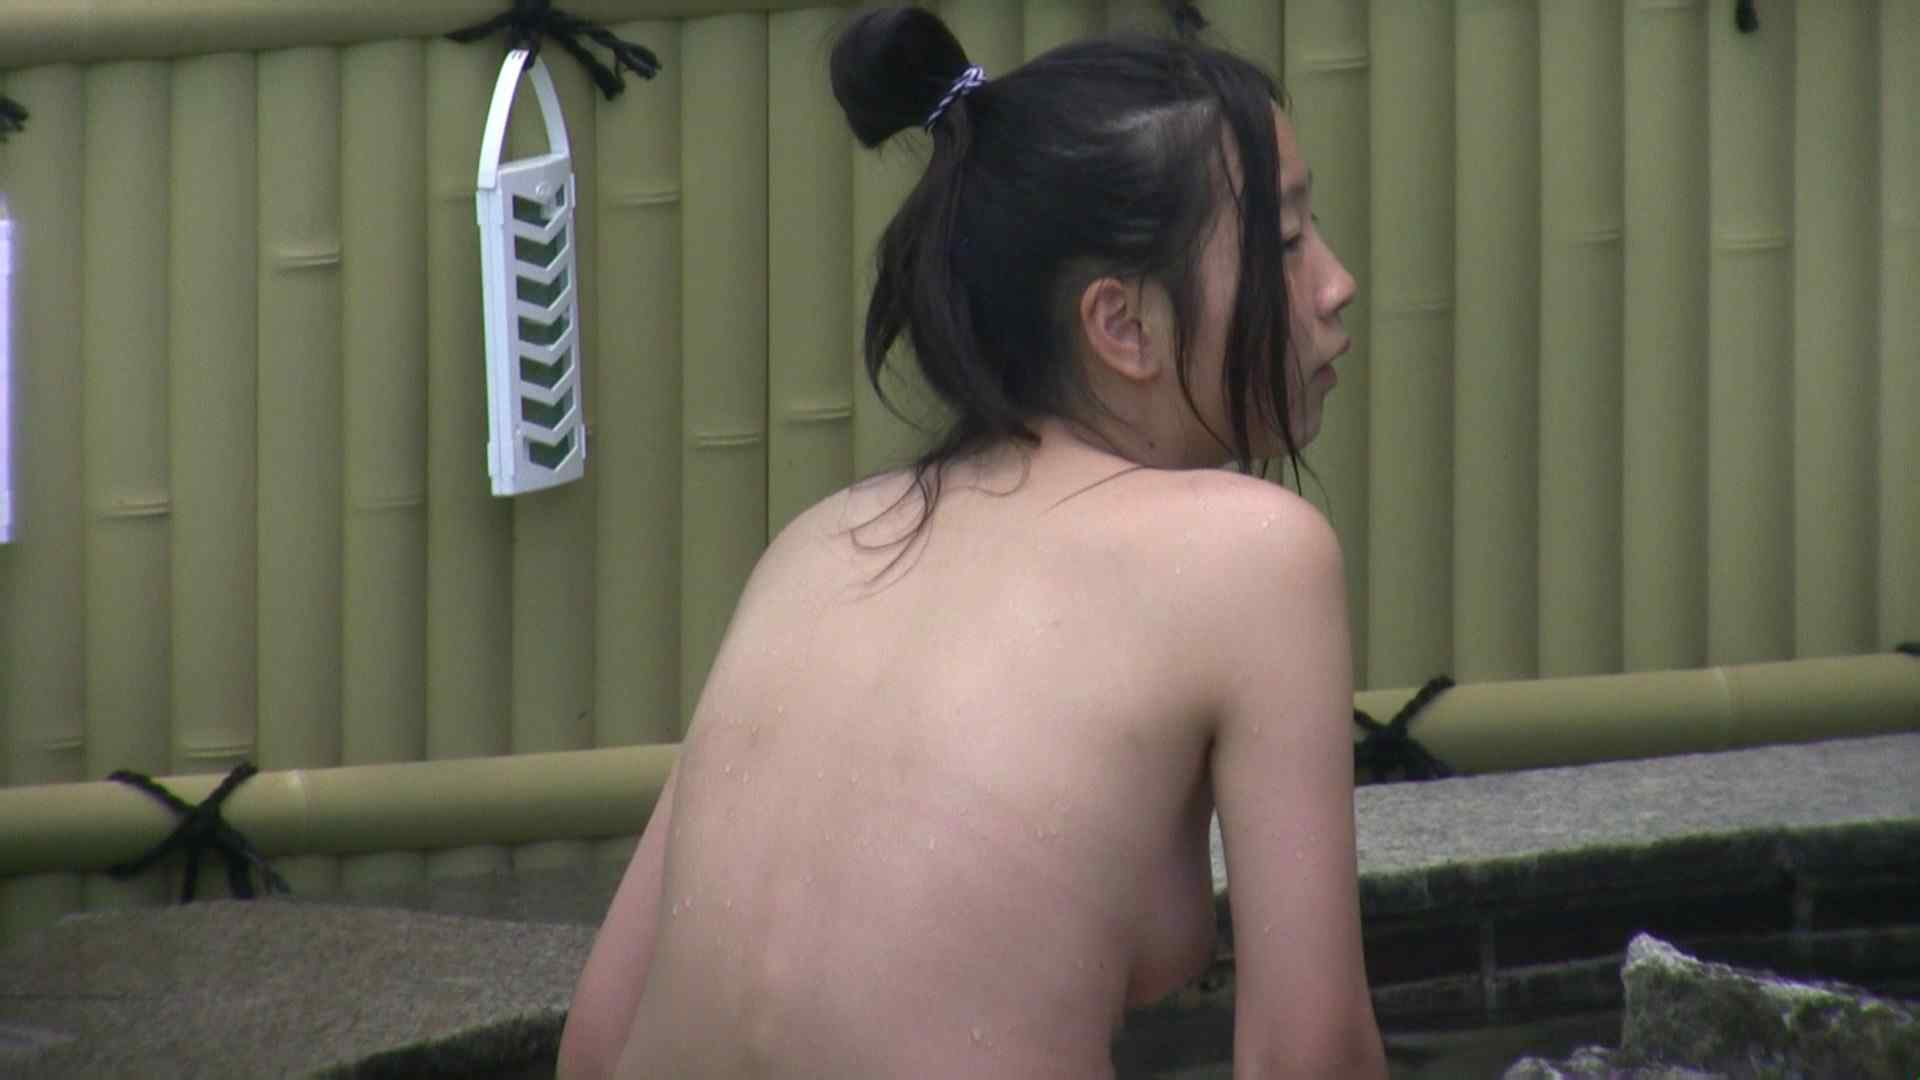 Aquaな露天風呂Vol.87【VIP限定】 盗撮 | HなOL  72pic 65